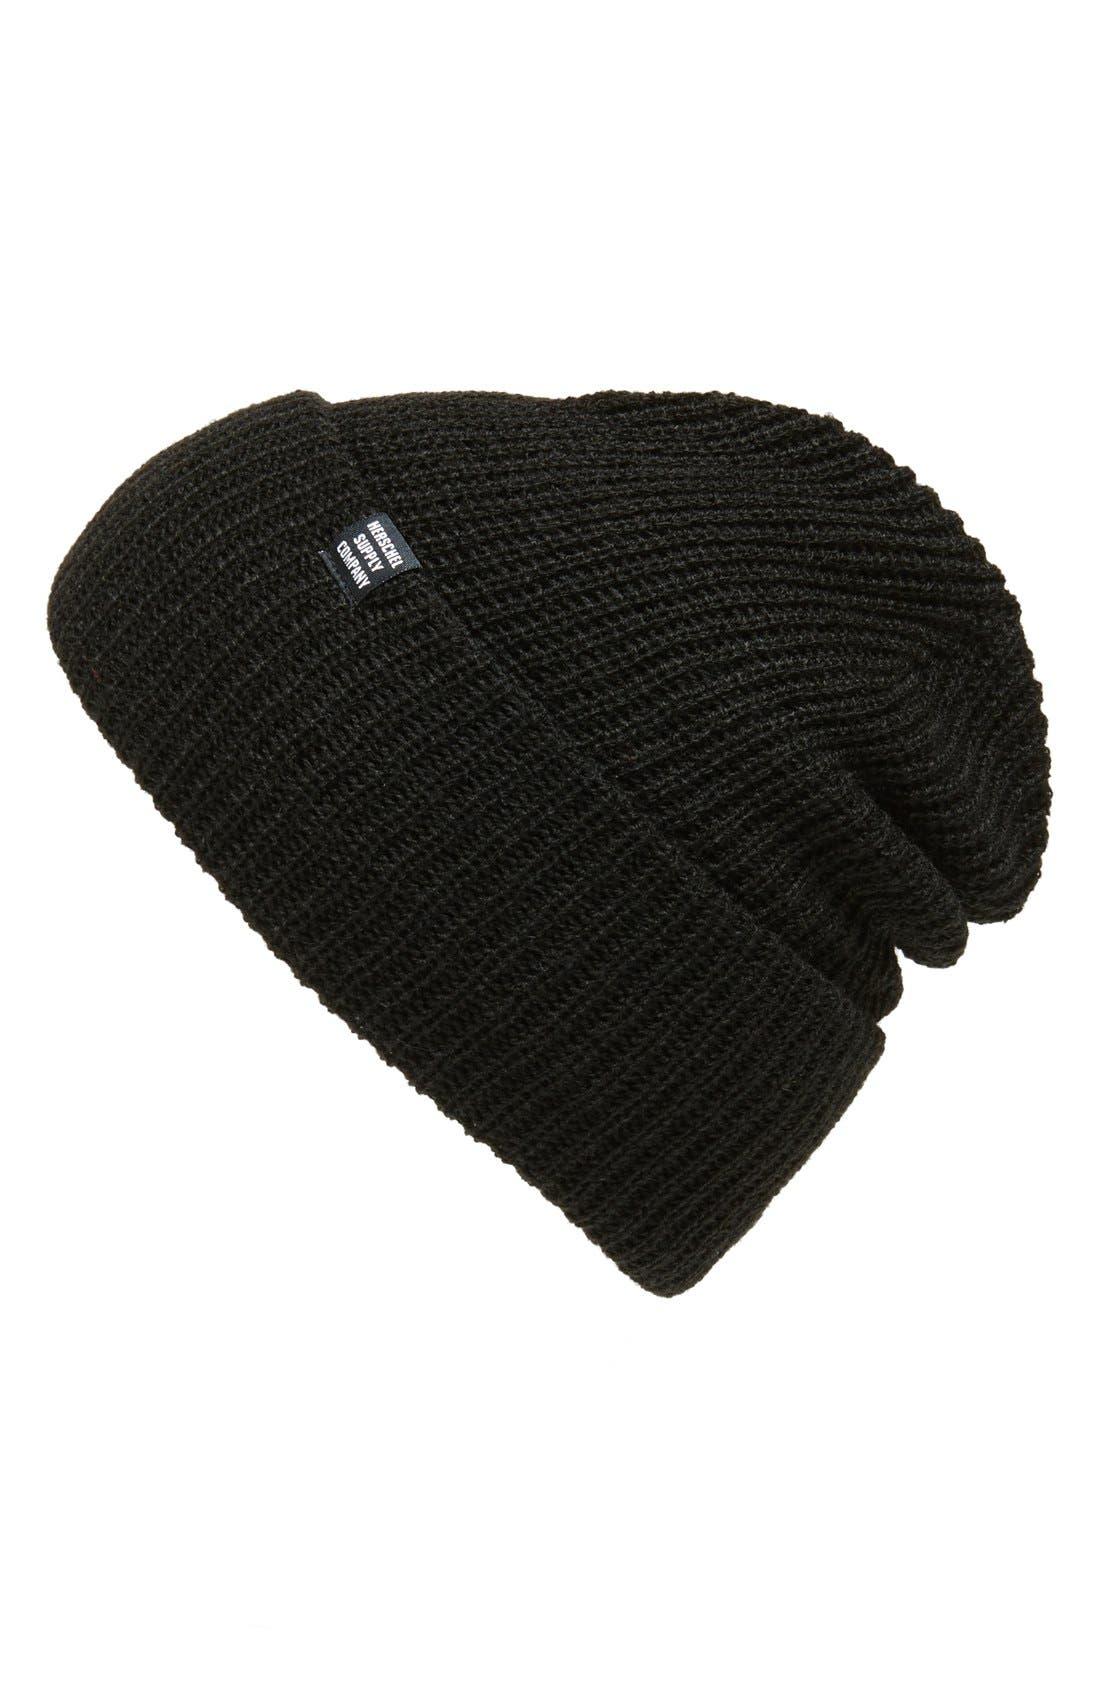 Main Image - Herschel Supply Co. 'Quartz' Solid Knit Cap